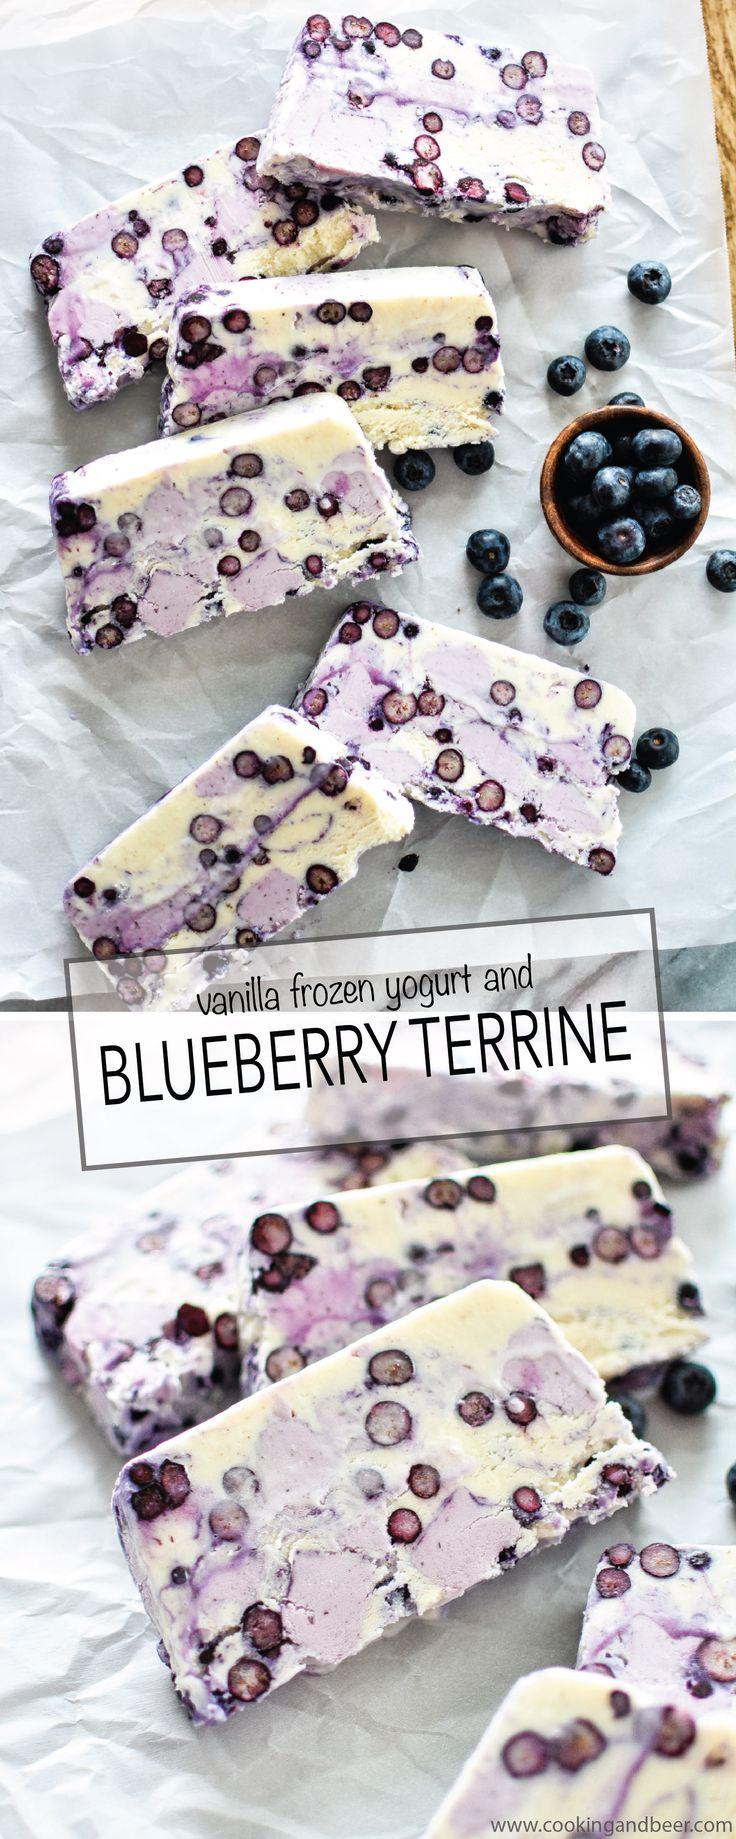 Vanilla Frozen Yogurt and Blueberry Terrine is the dessert recipe you NEED to serve this summer! | www.cookingandbeer.com